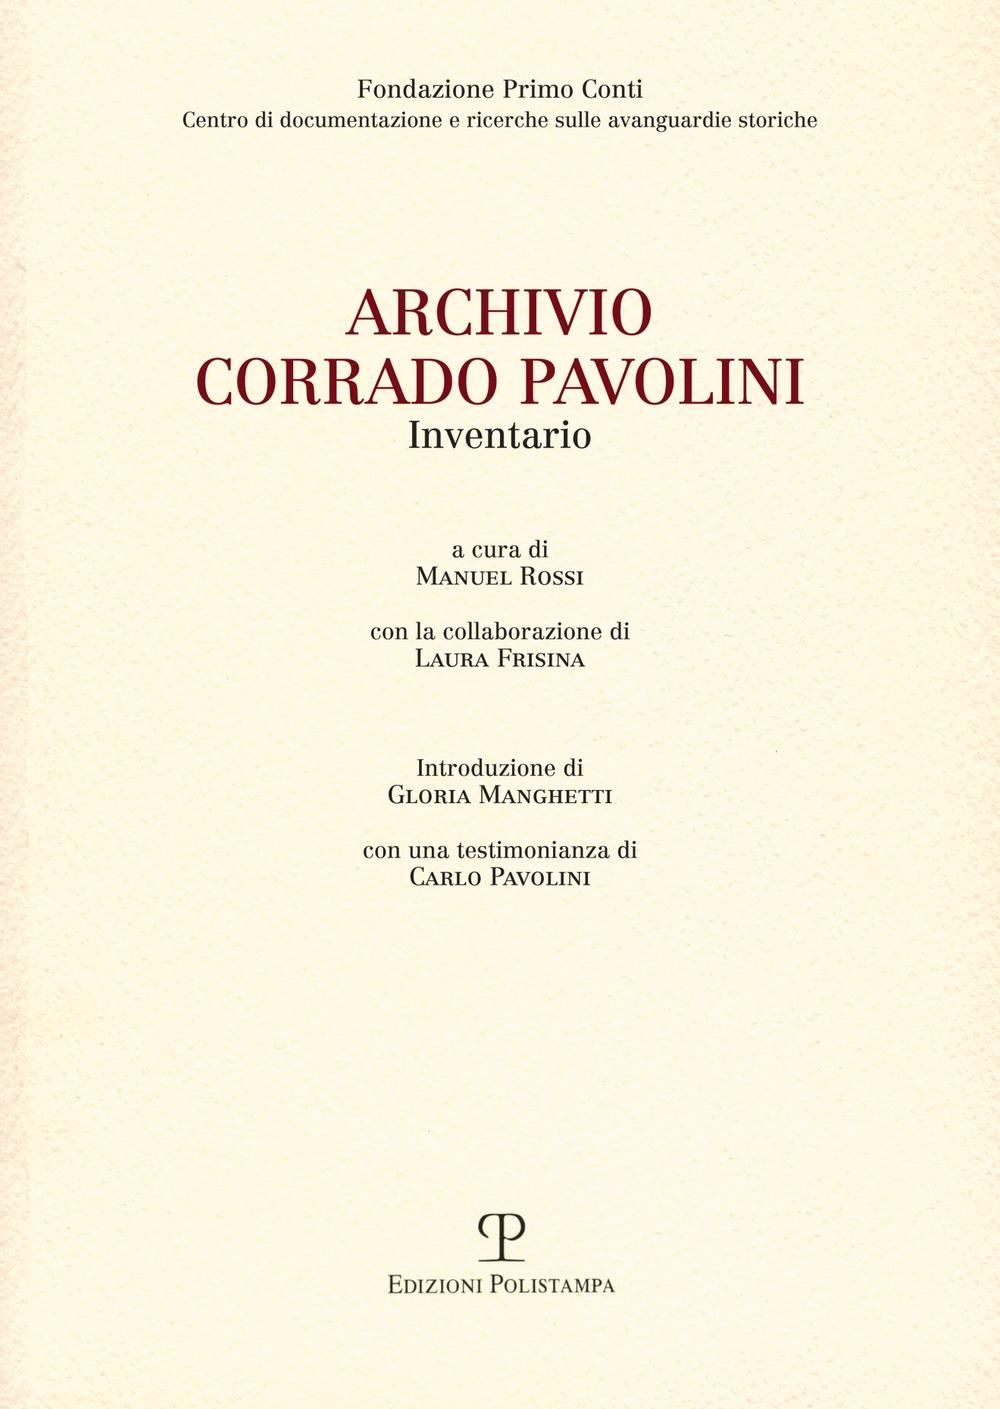 Archivio Corrado Pavolini. Inventario